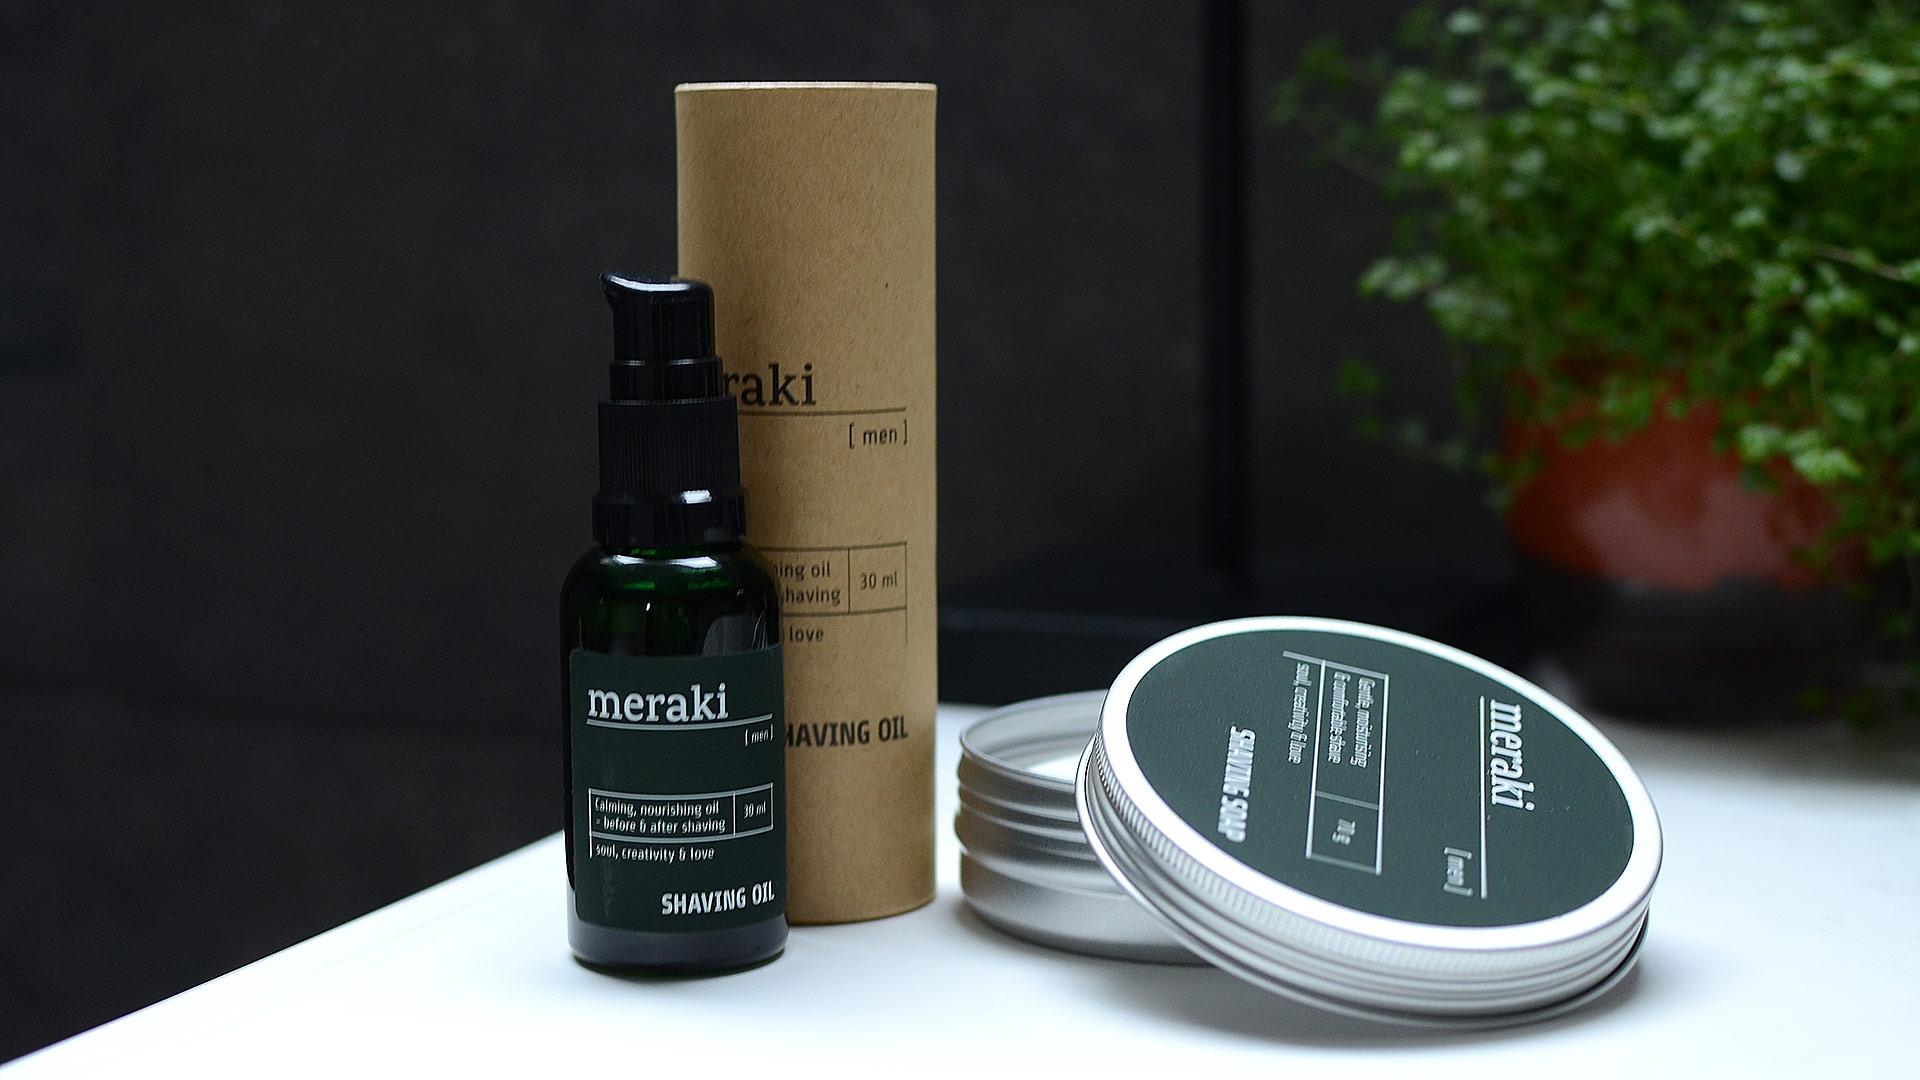 Meraki-men's-shave-collection